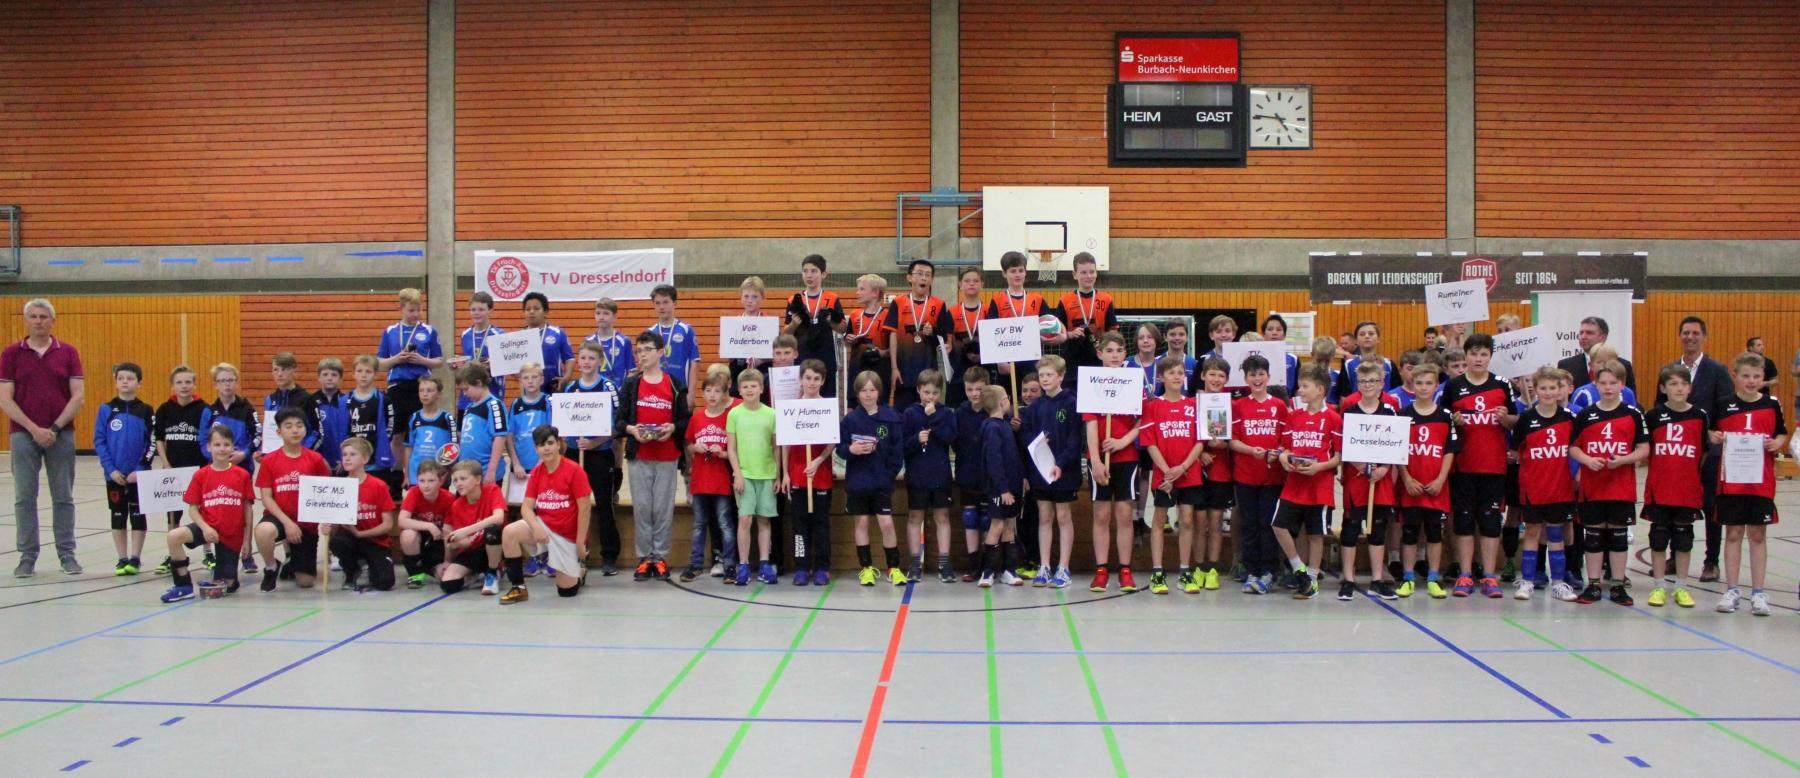 Westdeutsche-Meisterschaften-2018_U13_Gruppenbild